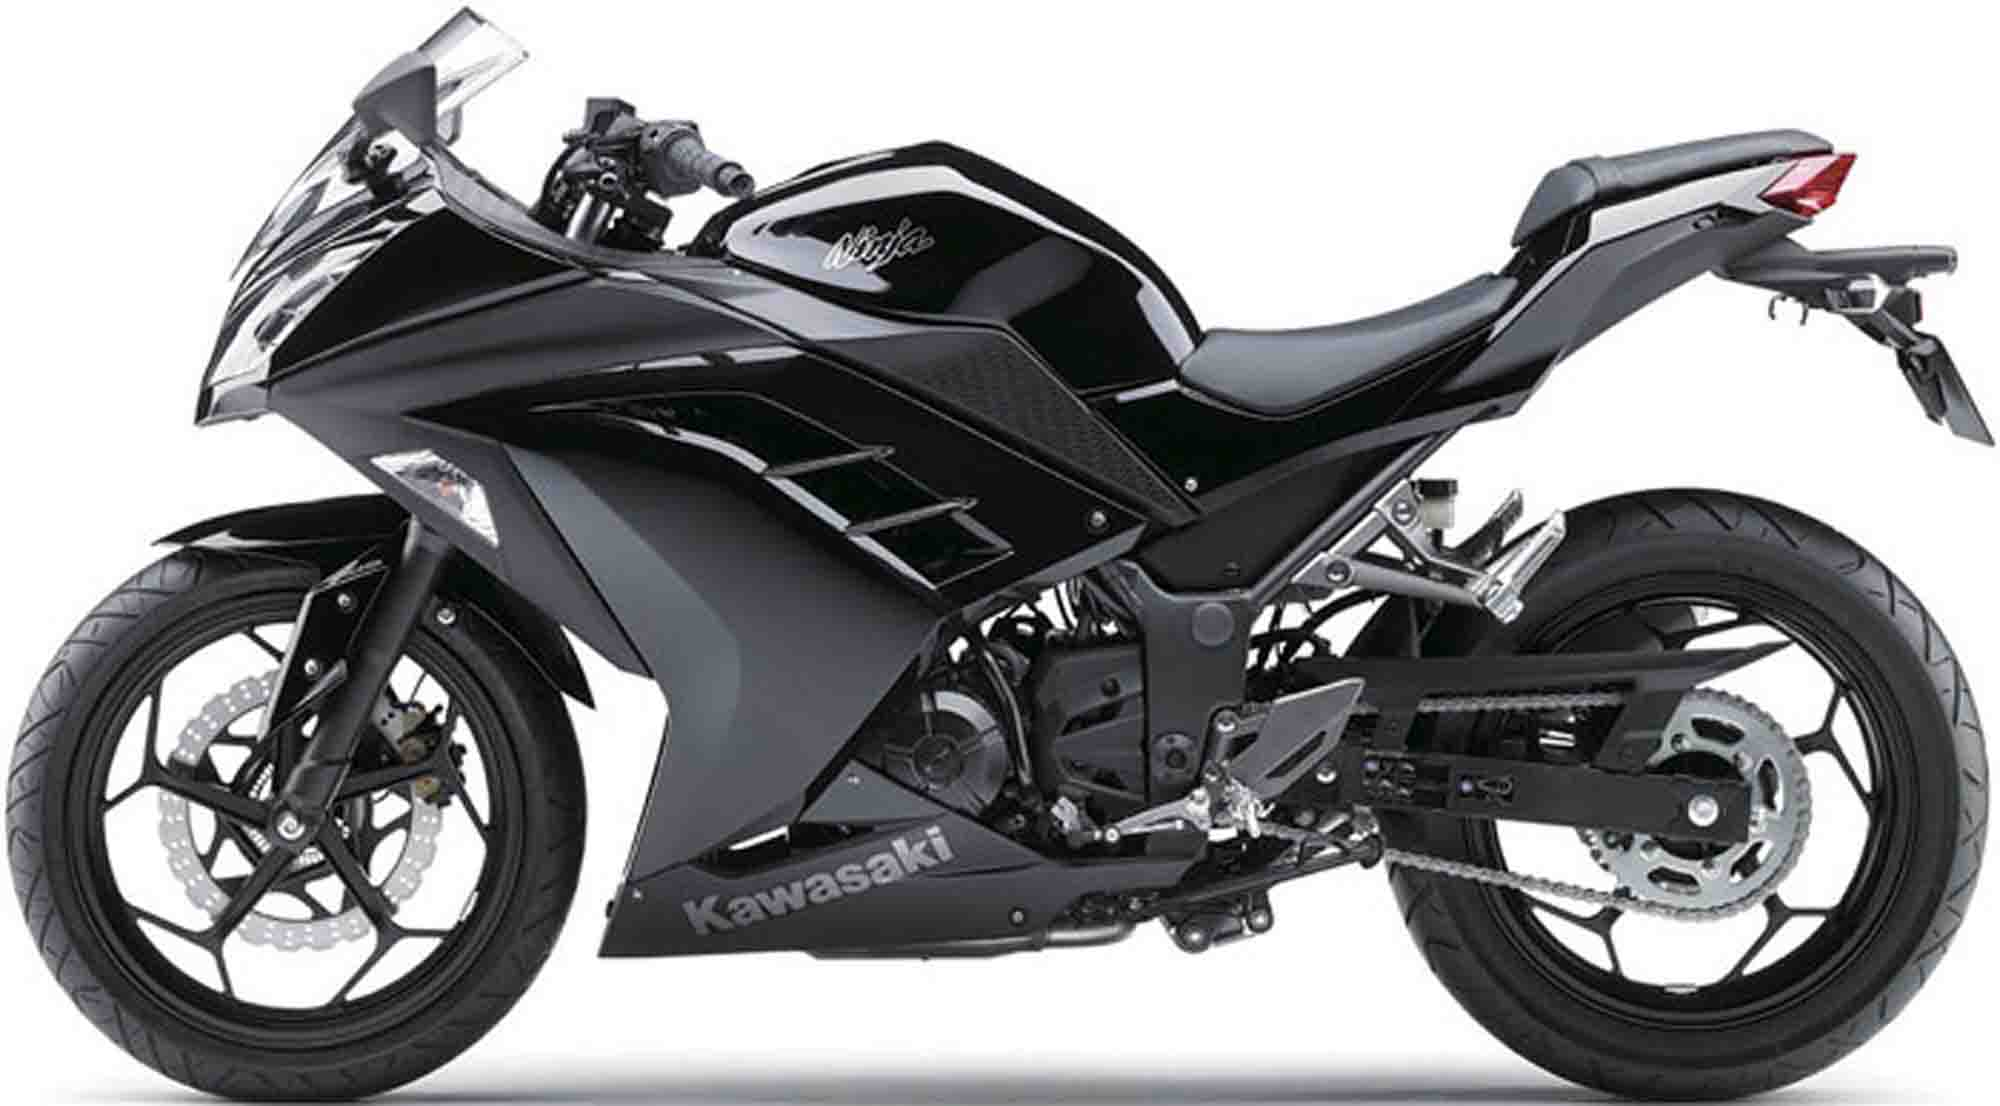 2015 Kawasaki Ninja 250r Wallpaper Wallpapersafari